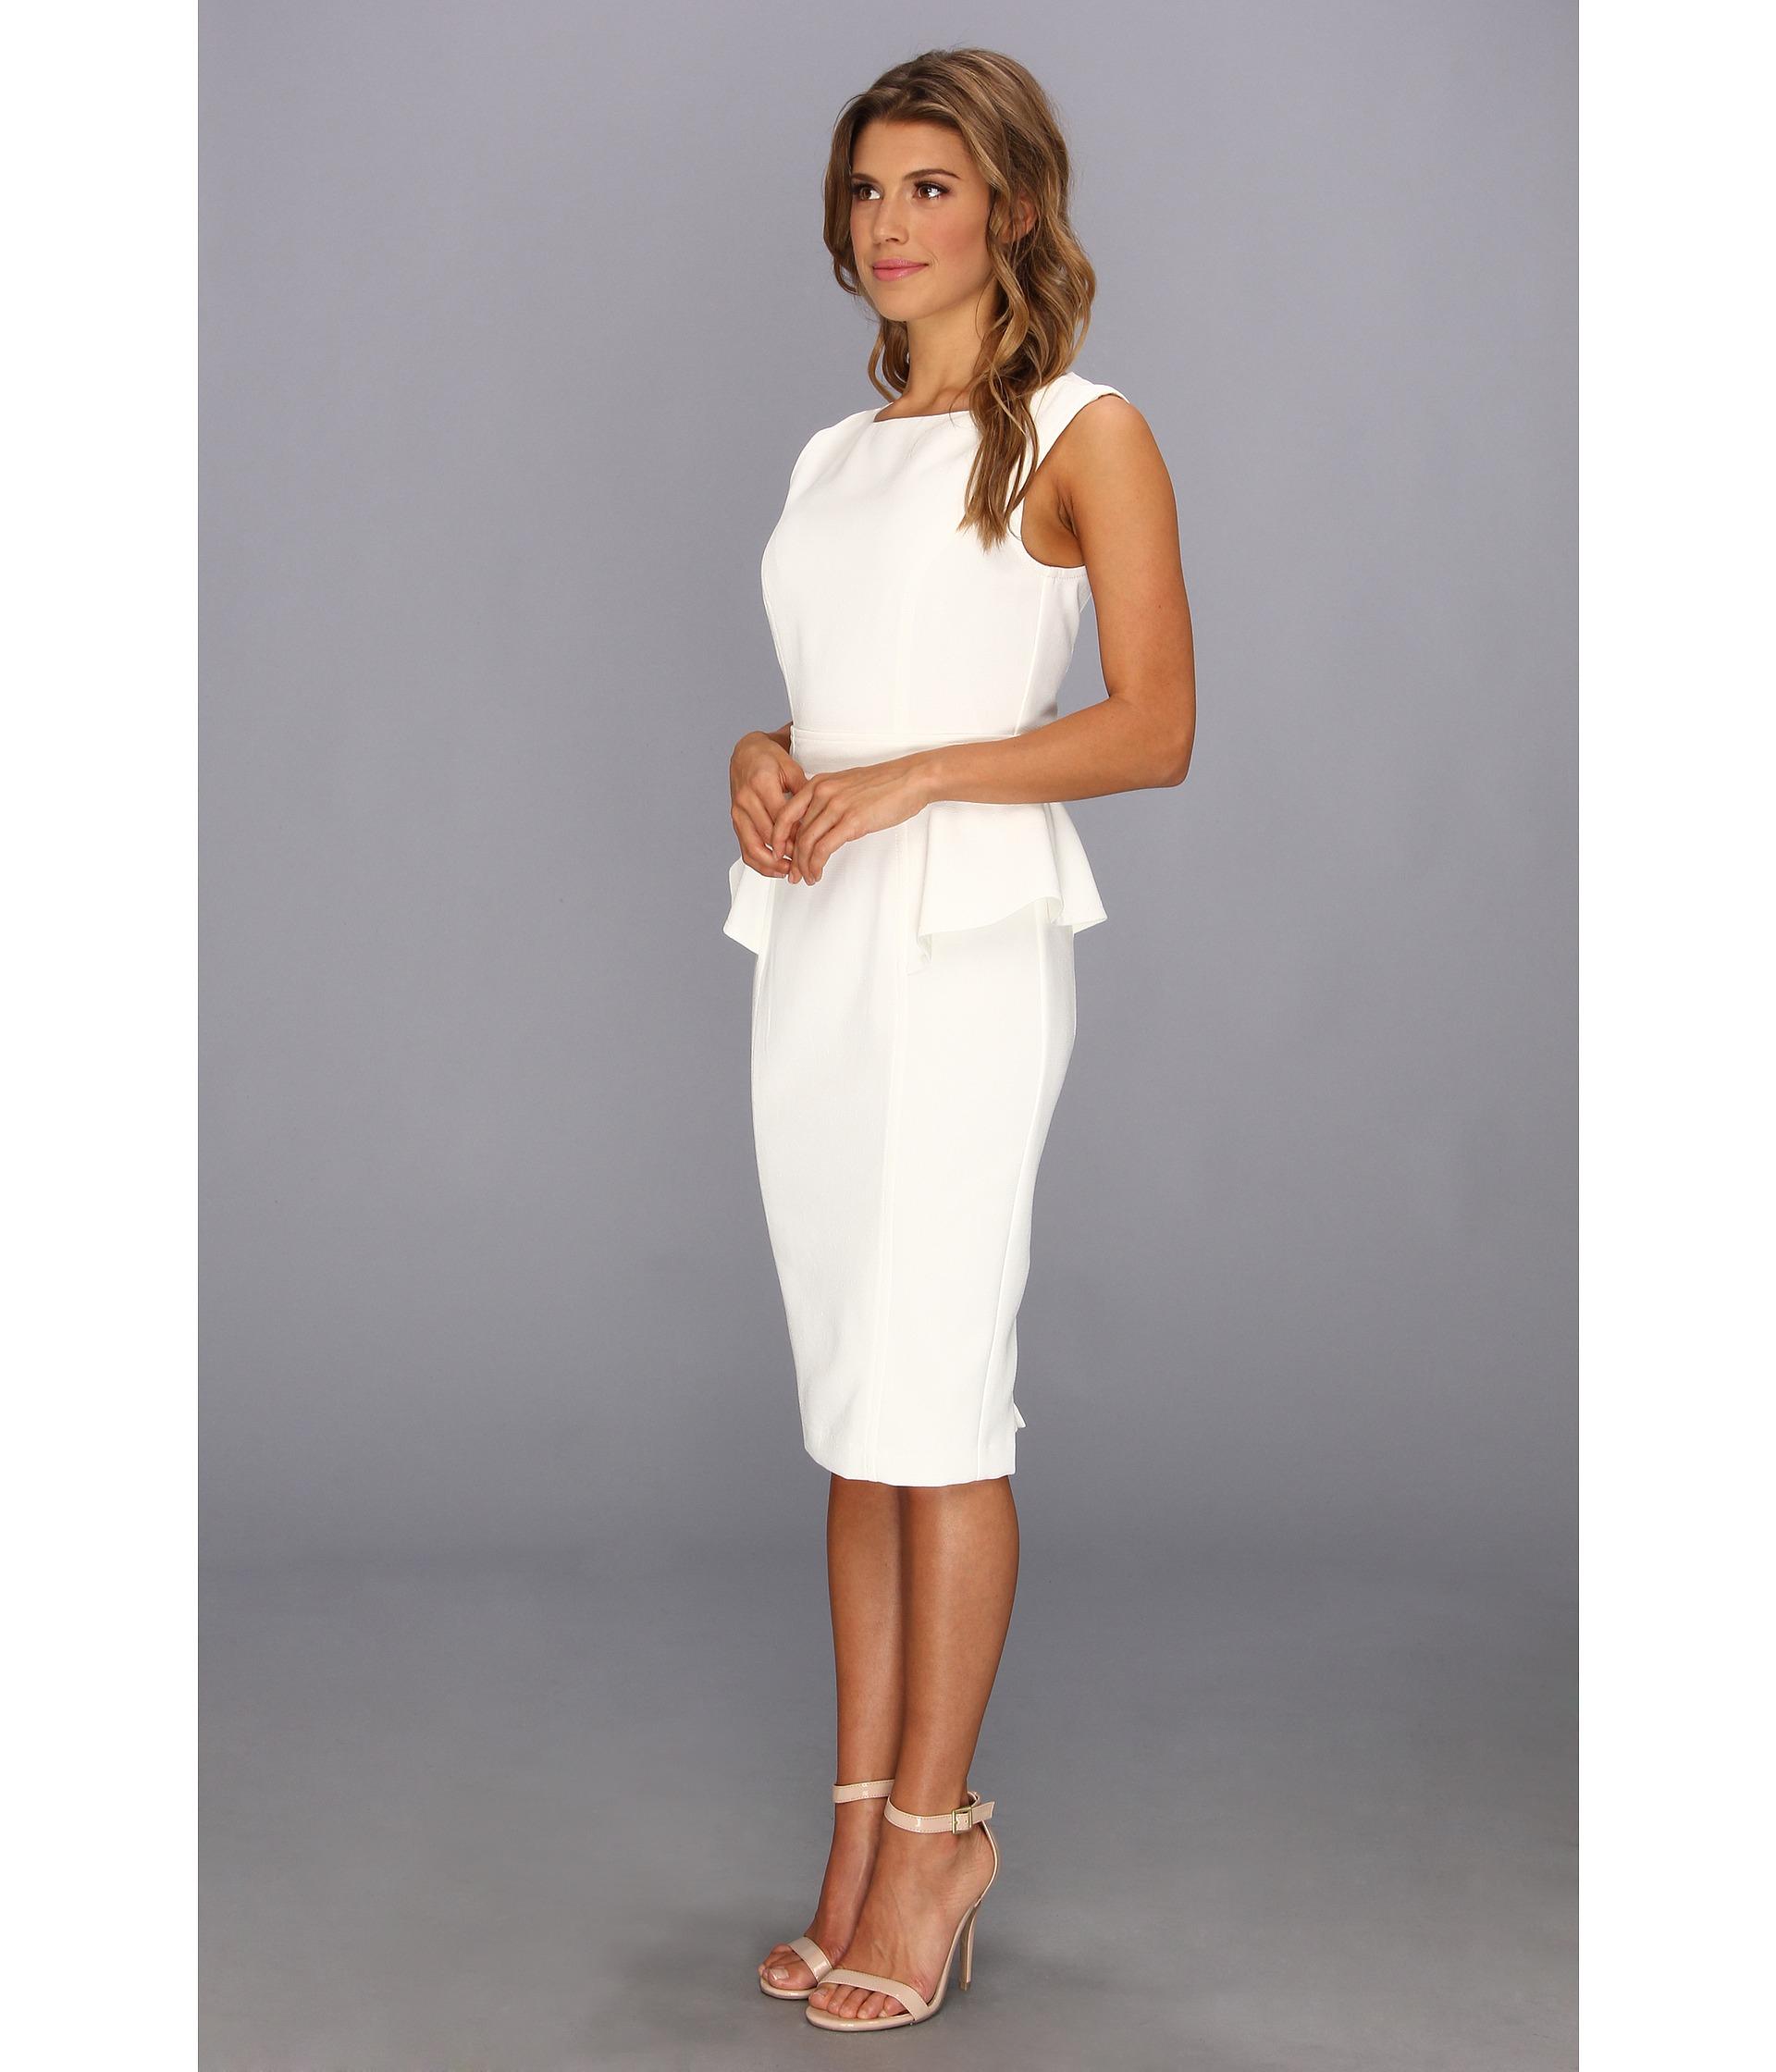 Lyst Badgley Mischka Pebble Crepe Peplum Cocktail Dress In White